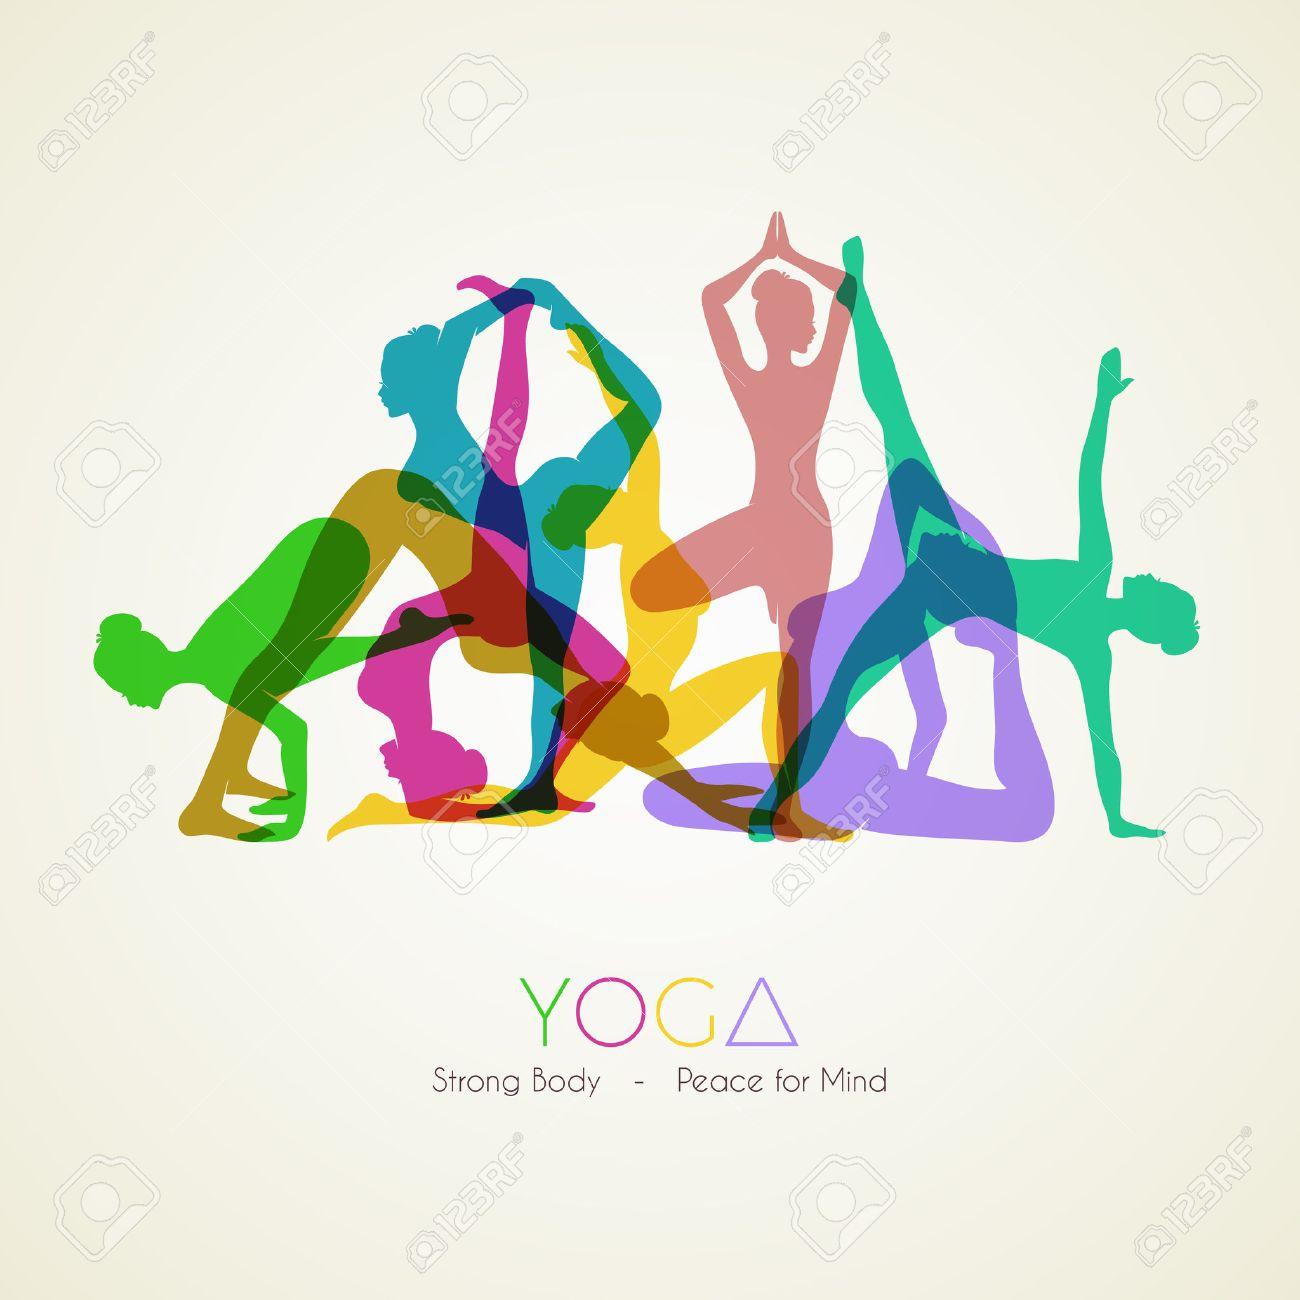 1300x1300 Yoga Position, Asana Meditation, Mindfulness, Zen. Vector Linear